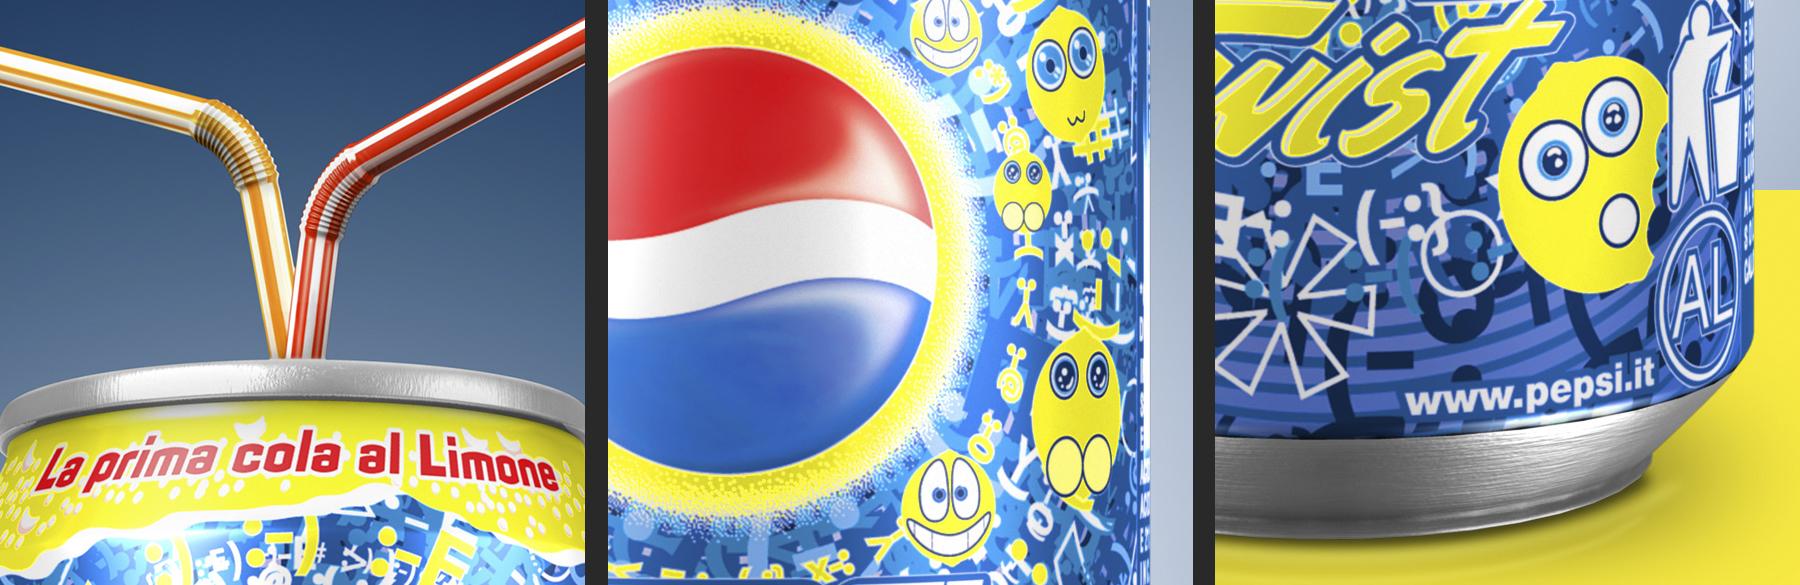 Prisma Associati</br>Pepsi Twist can